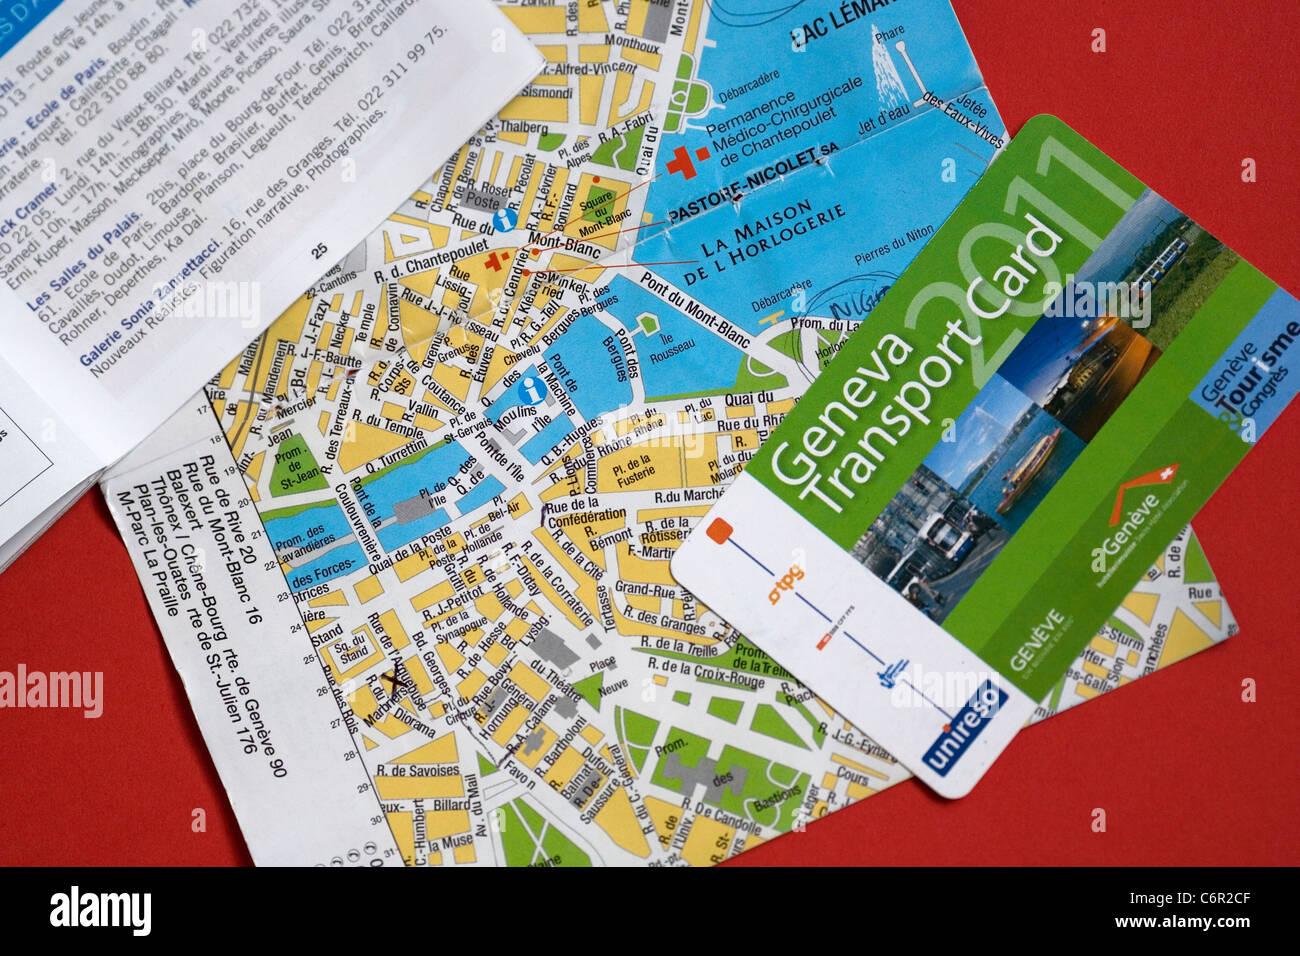 Geneva Transport Card und Straßenkarte Stockfoto, Bild ...